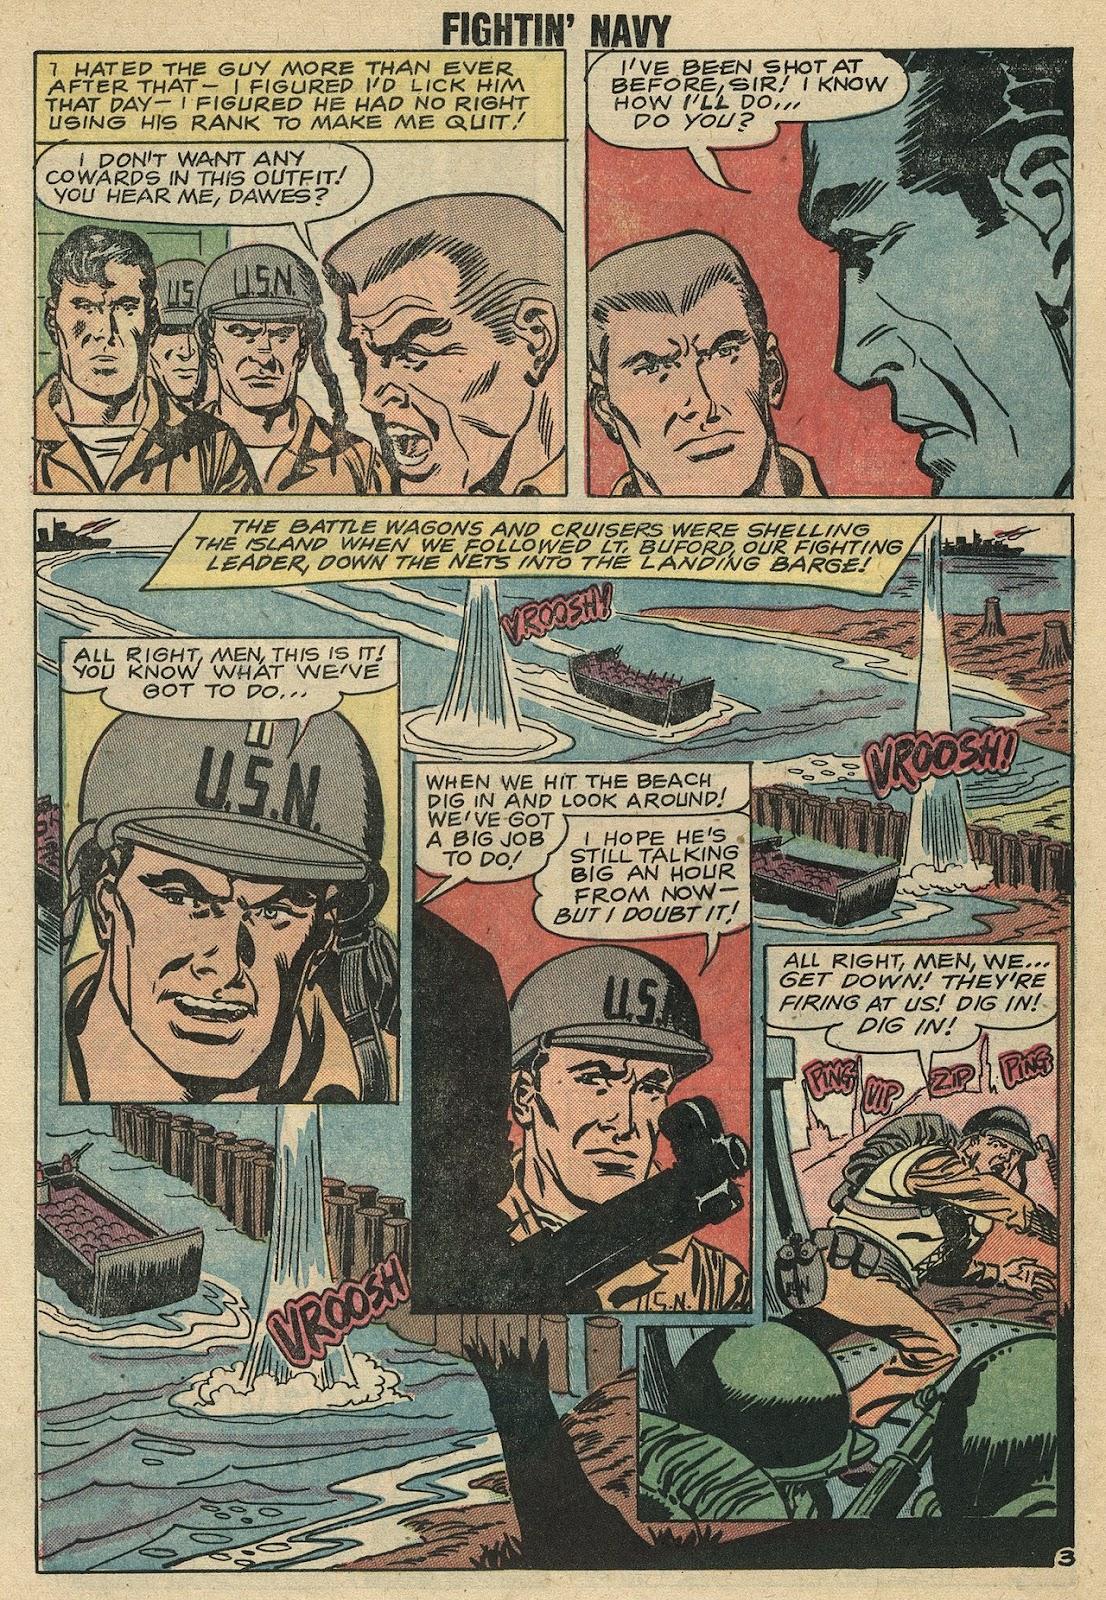 Read online Fightin' Navy comic -  Issue #86 - 29